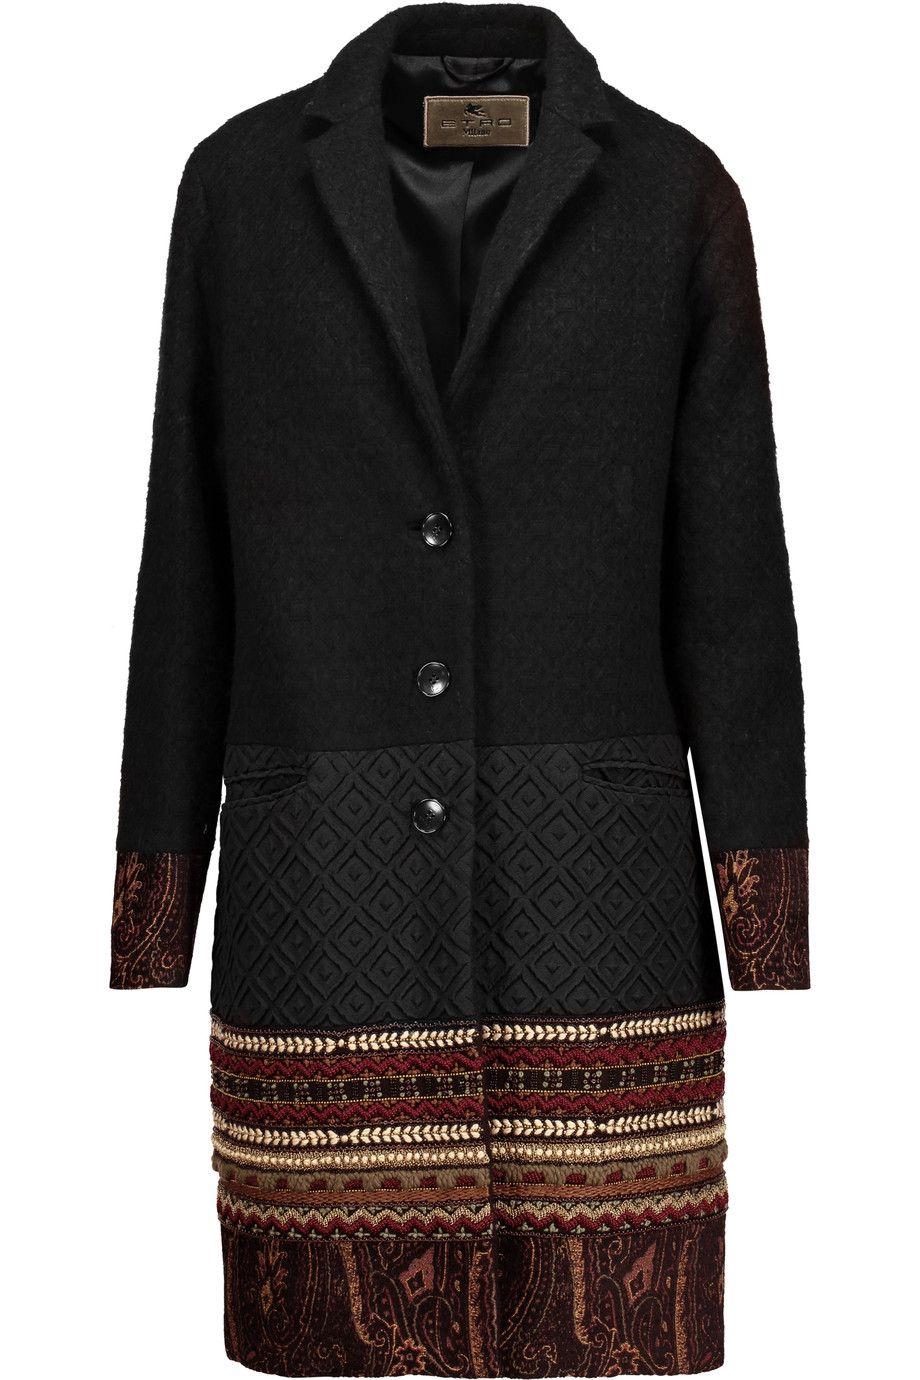 Shop on-sale Etro Embellished wool-blend jacquard and matelassé ...